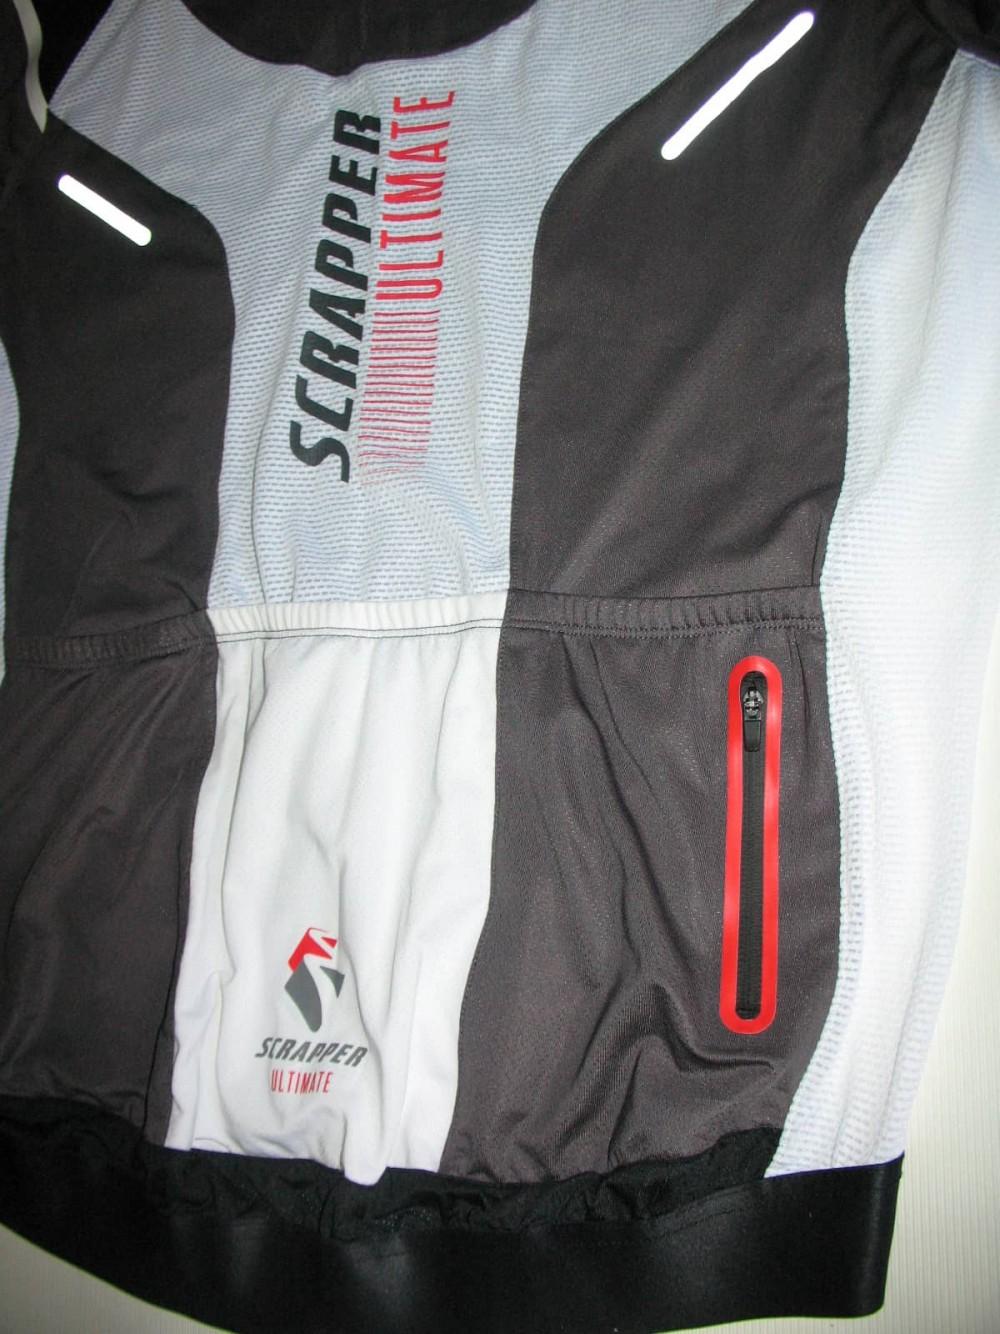 Веломайка SCRAPPER scr ultimate team jersey (размер XXL) - 3